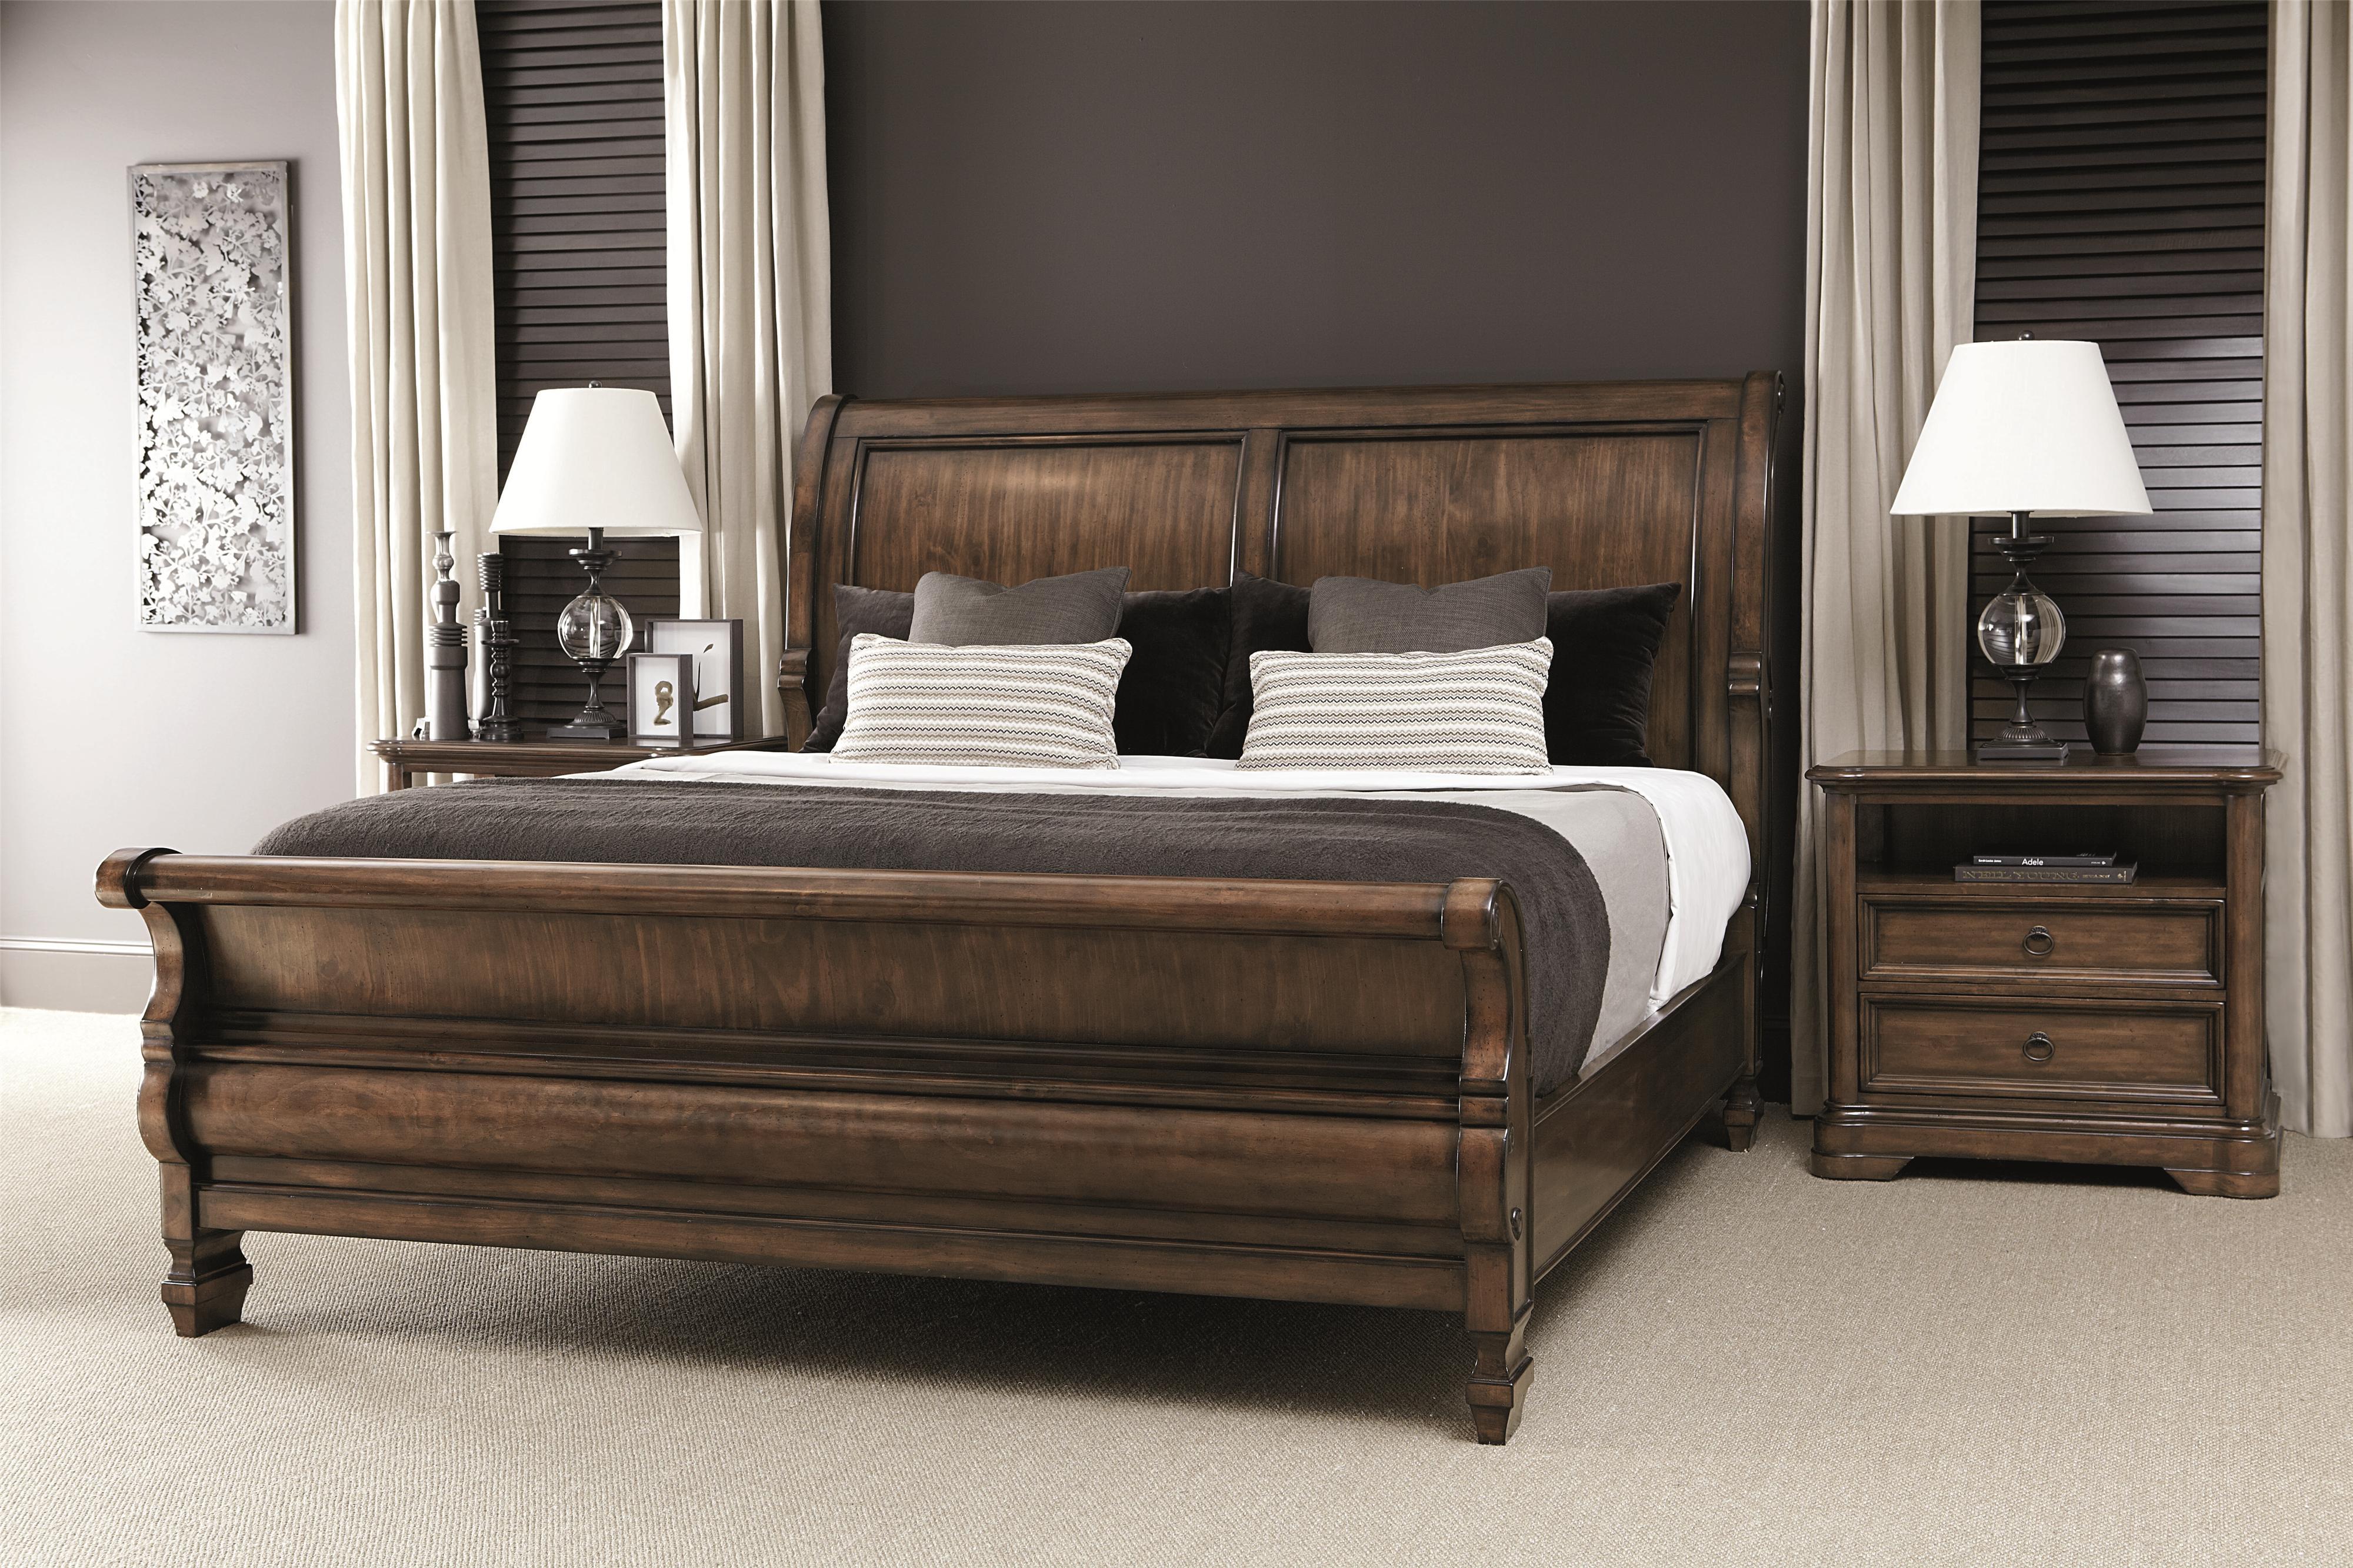 Bernhardt Montebella King Bedroom Group - Item Number: 350 K Bedroom Group 5